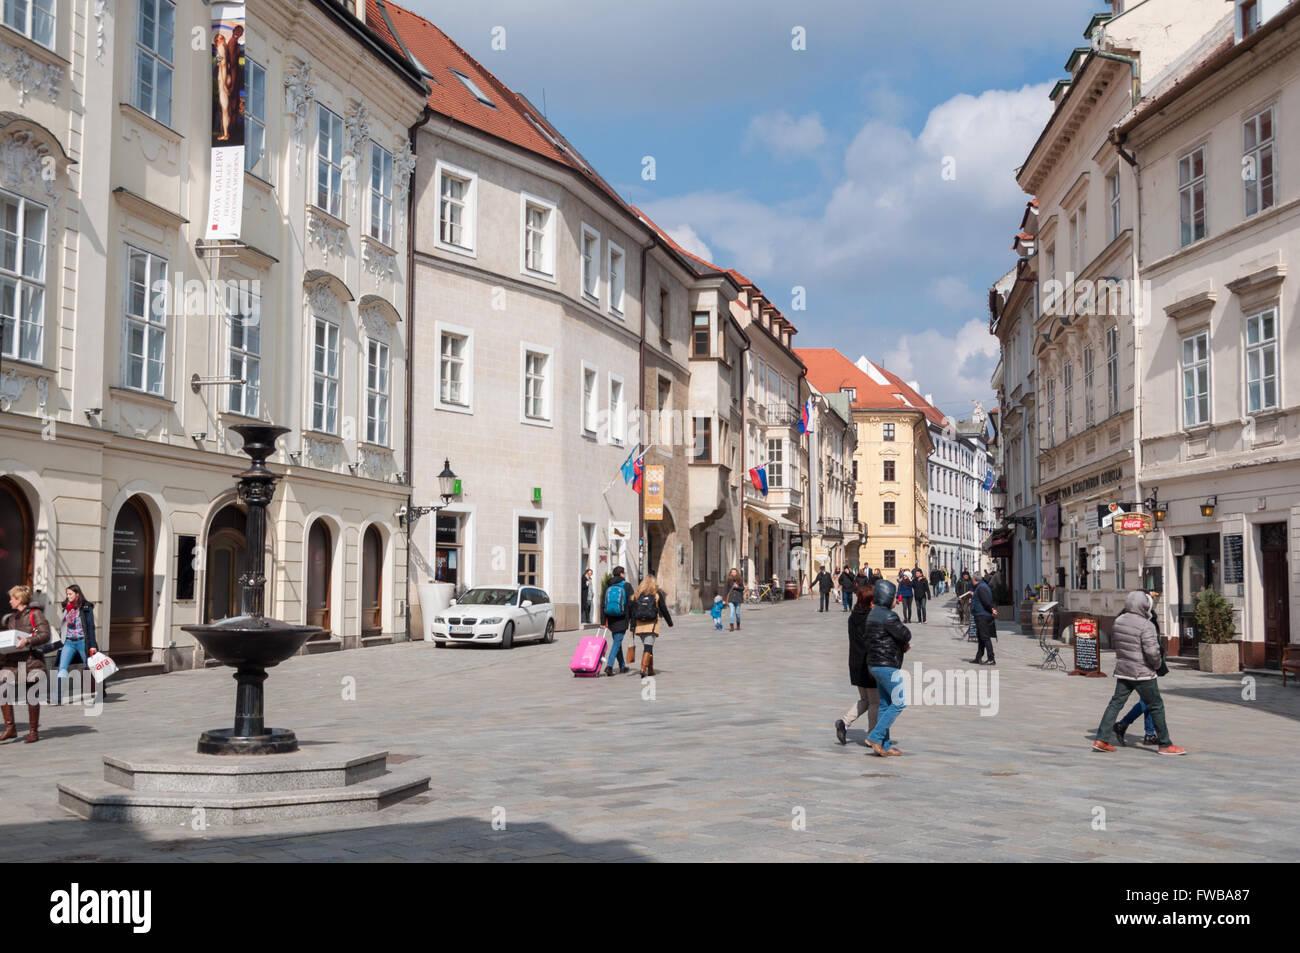 Venturska street with the Academia Istropolitana, Bratislava, Slovakia - Stock Image